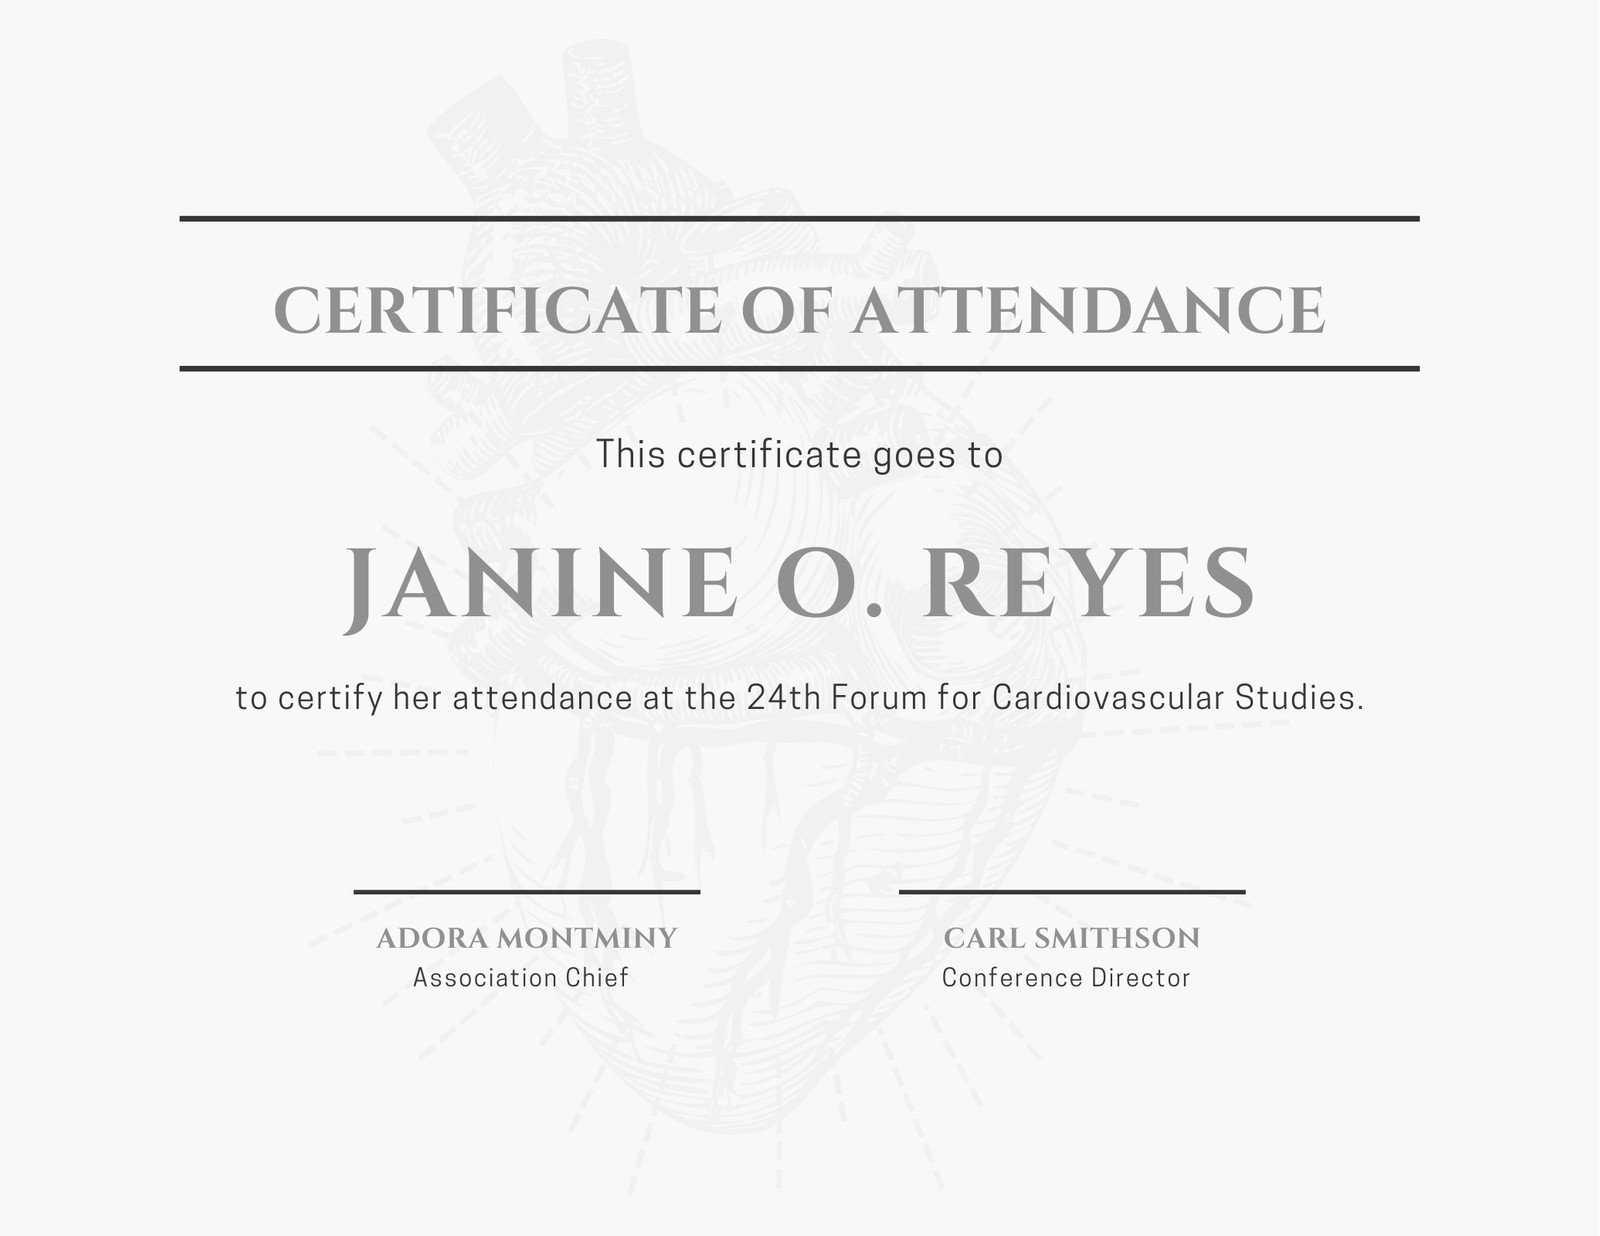 Minimalist Conference Attendance Certificate - Templates Intended For Conference Certificate Of Attendance Template